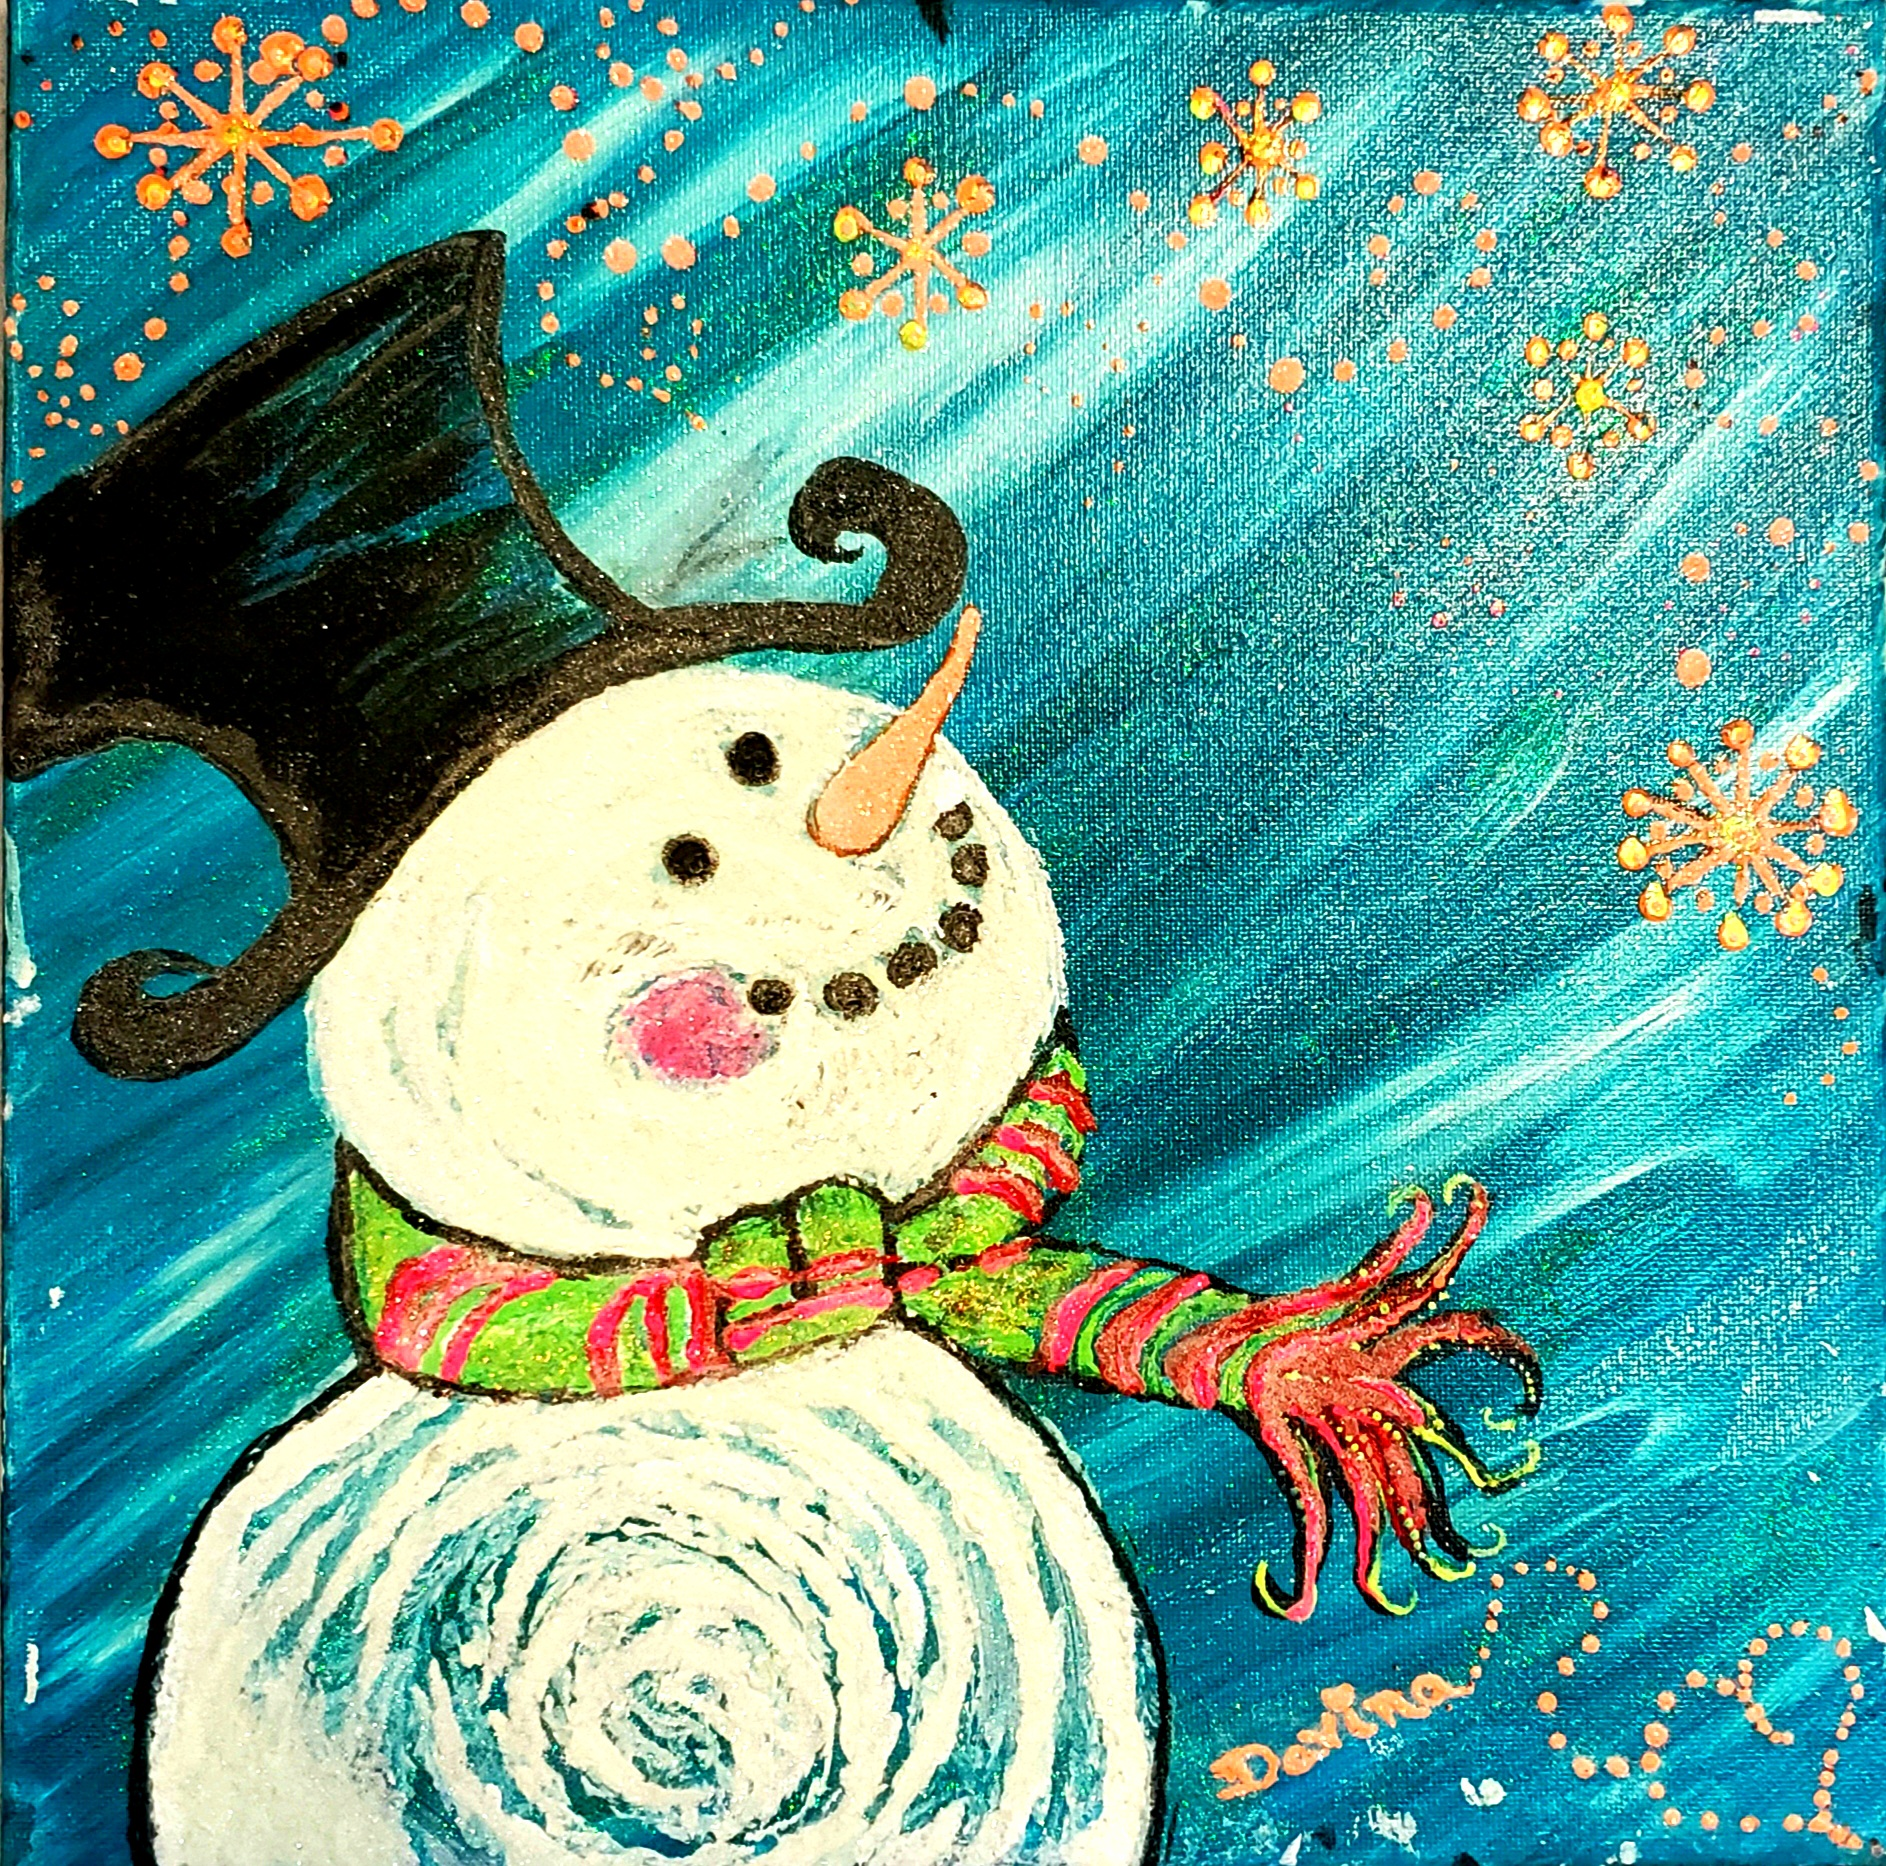 Glow in the Dark Snowflake Snowman Day